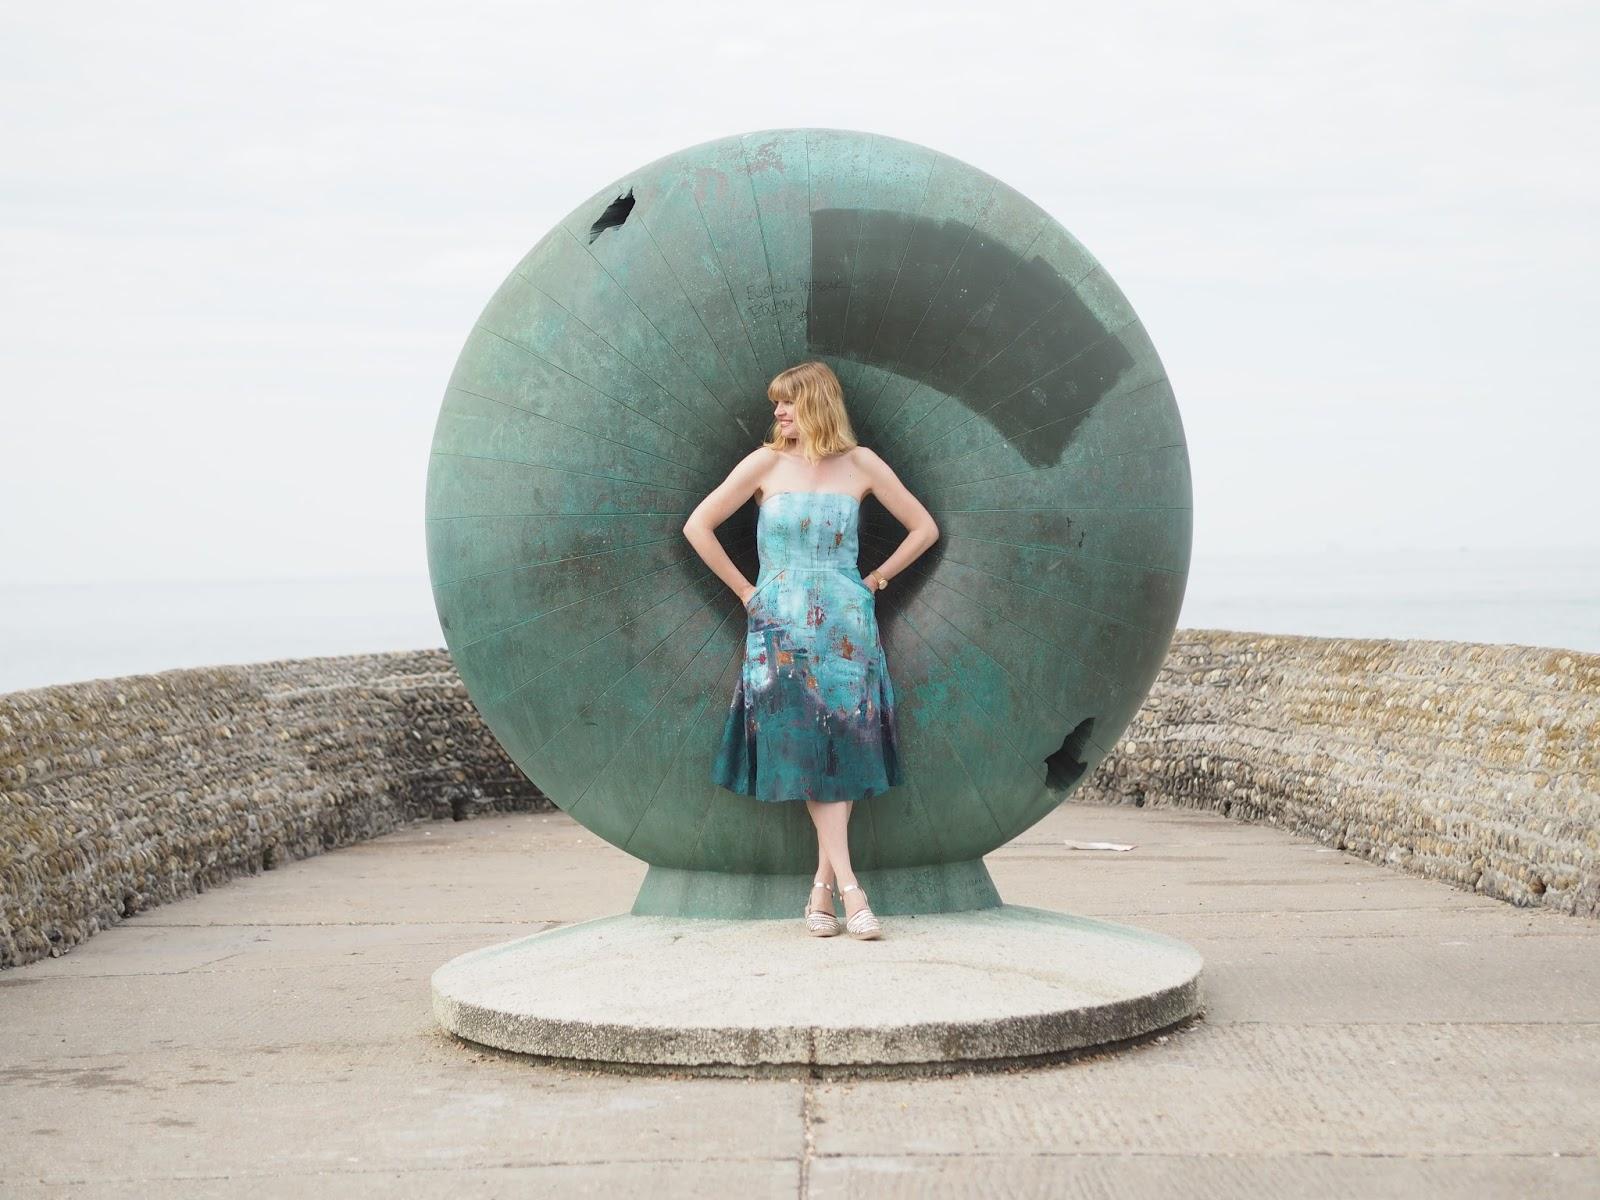 Afloat, Donut sculpture, Brighton sea front